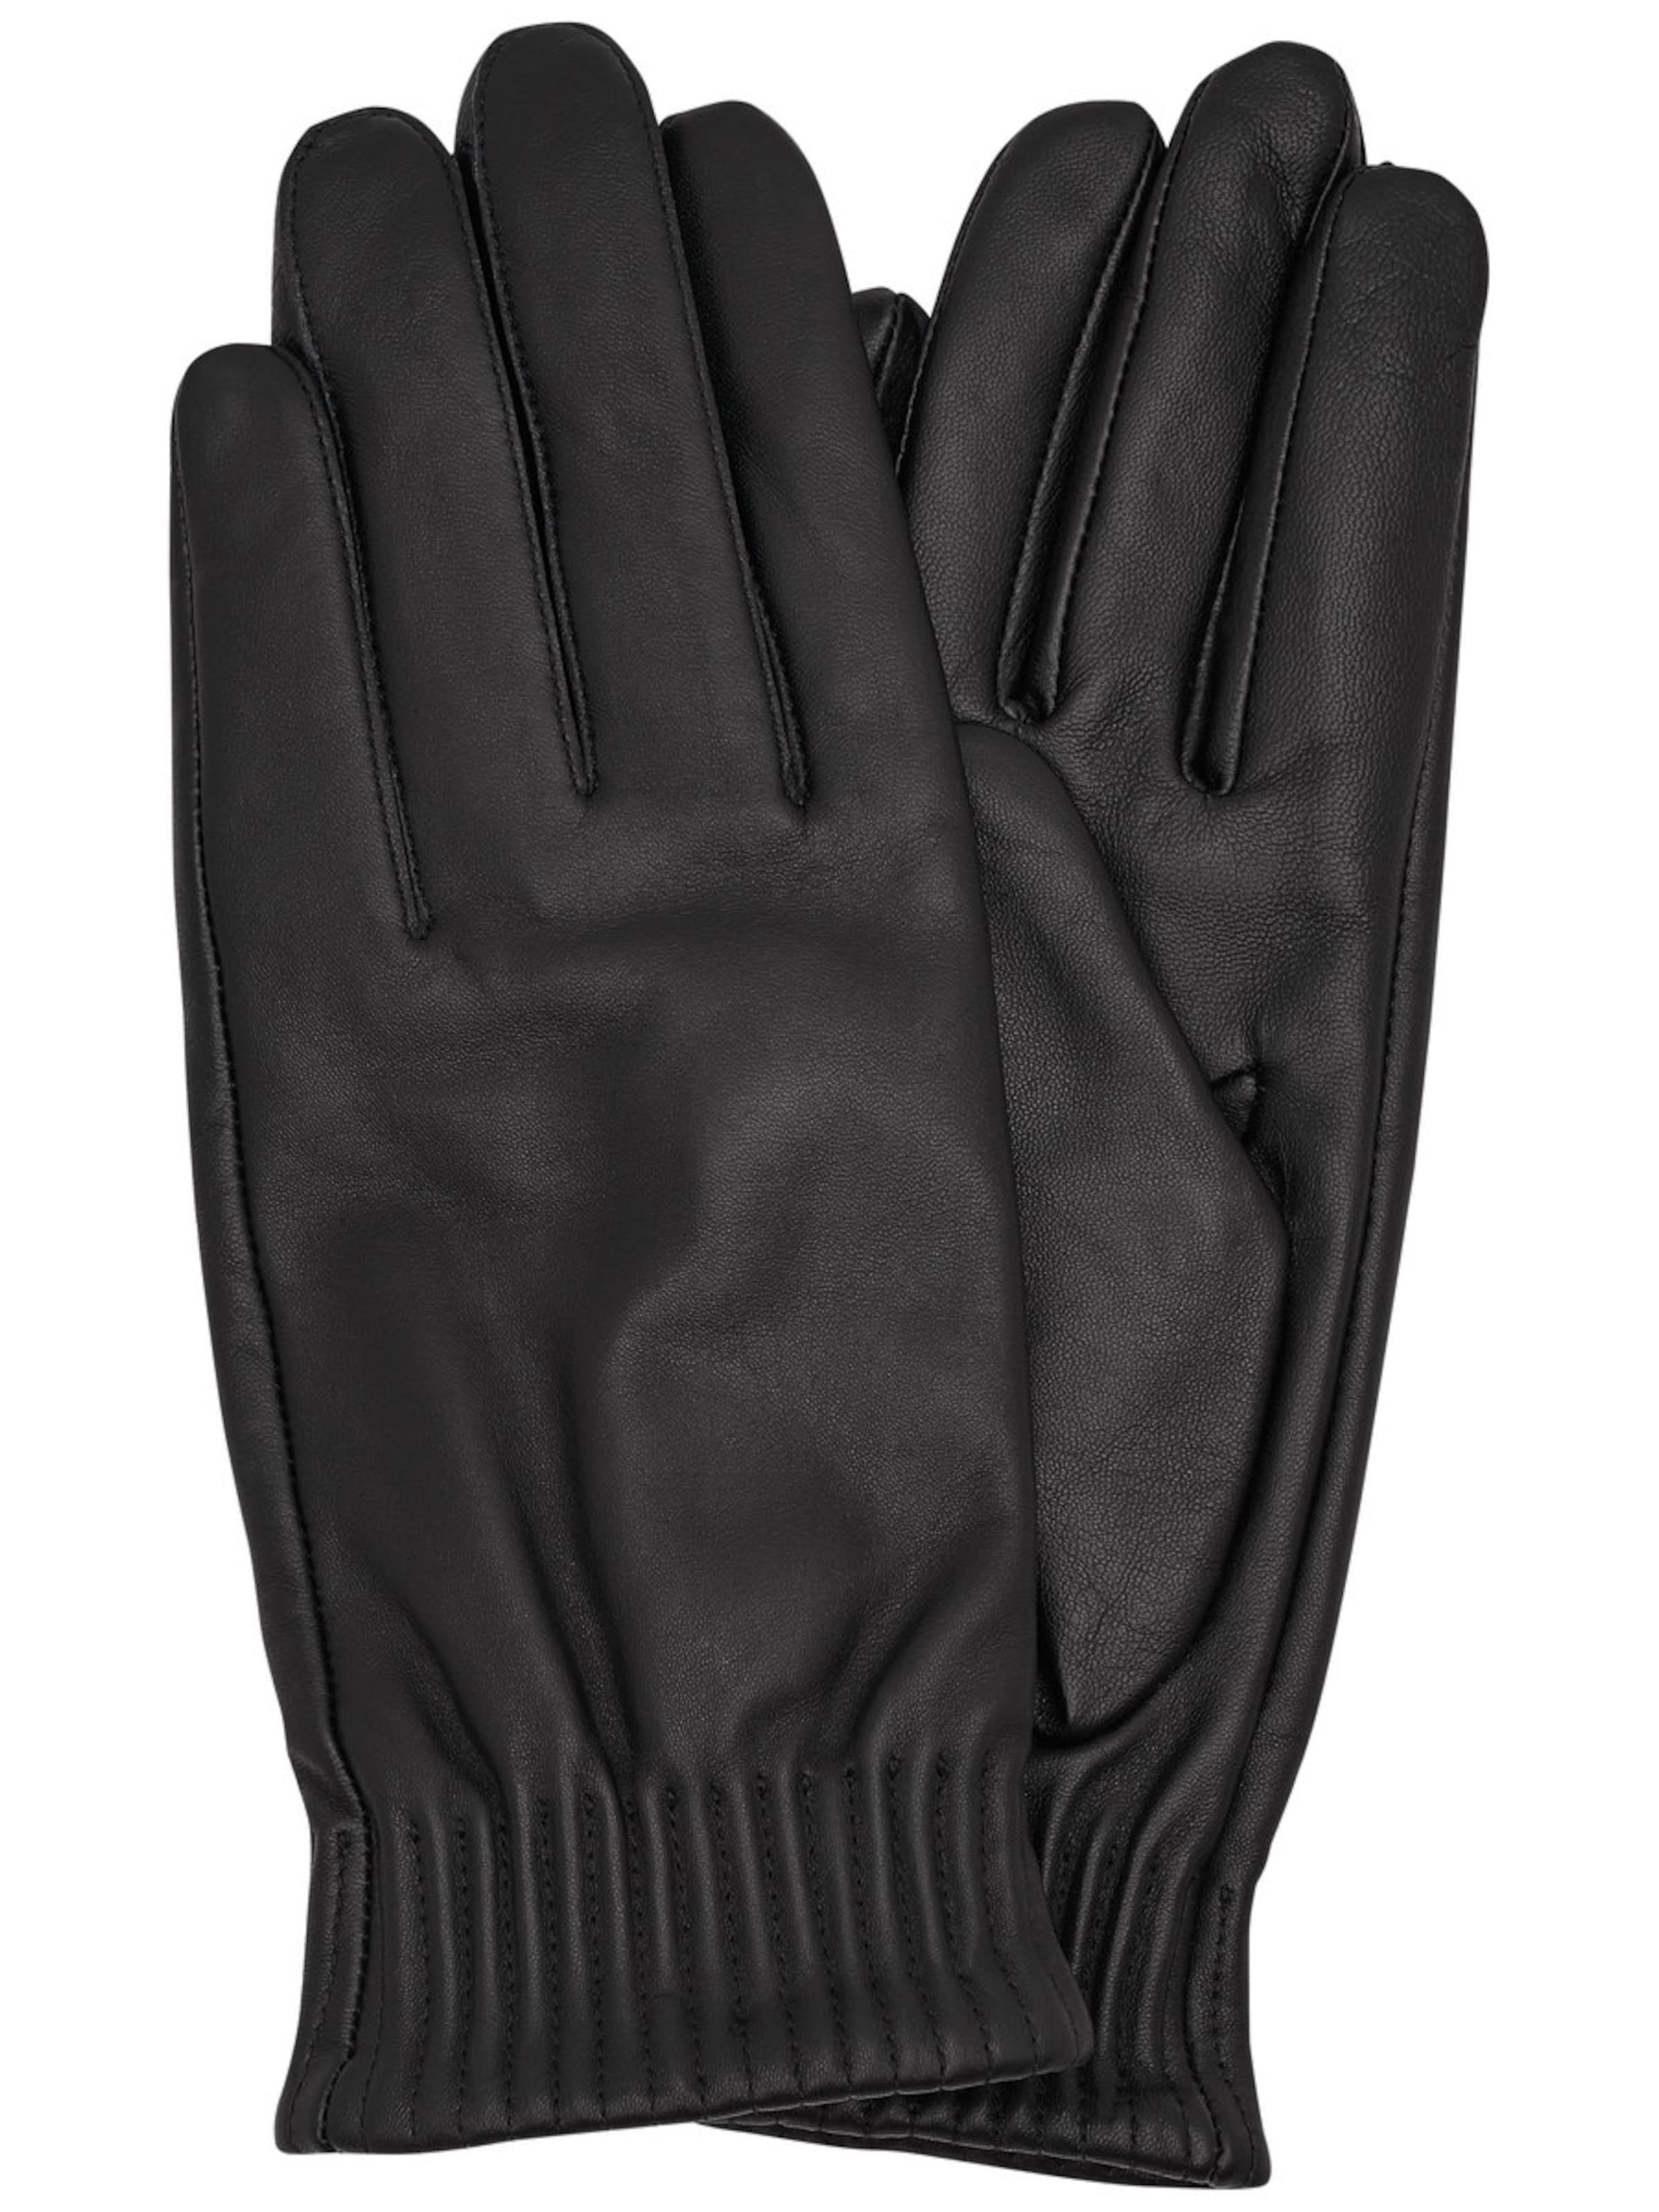 ONLY Leder-Handschuhe Erschwinglich dk7YjxHx